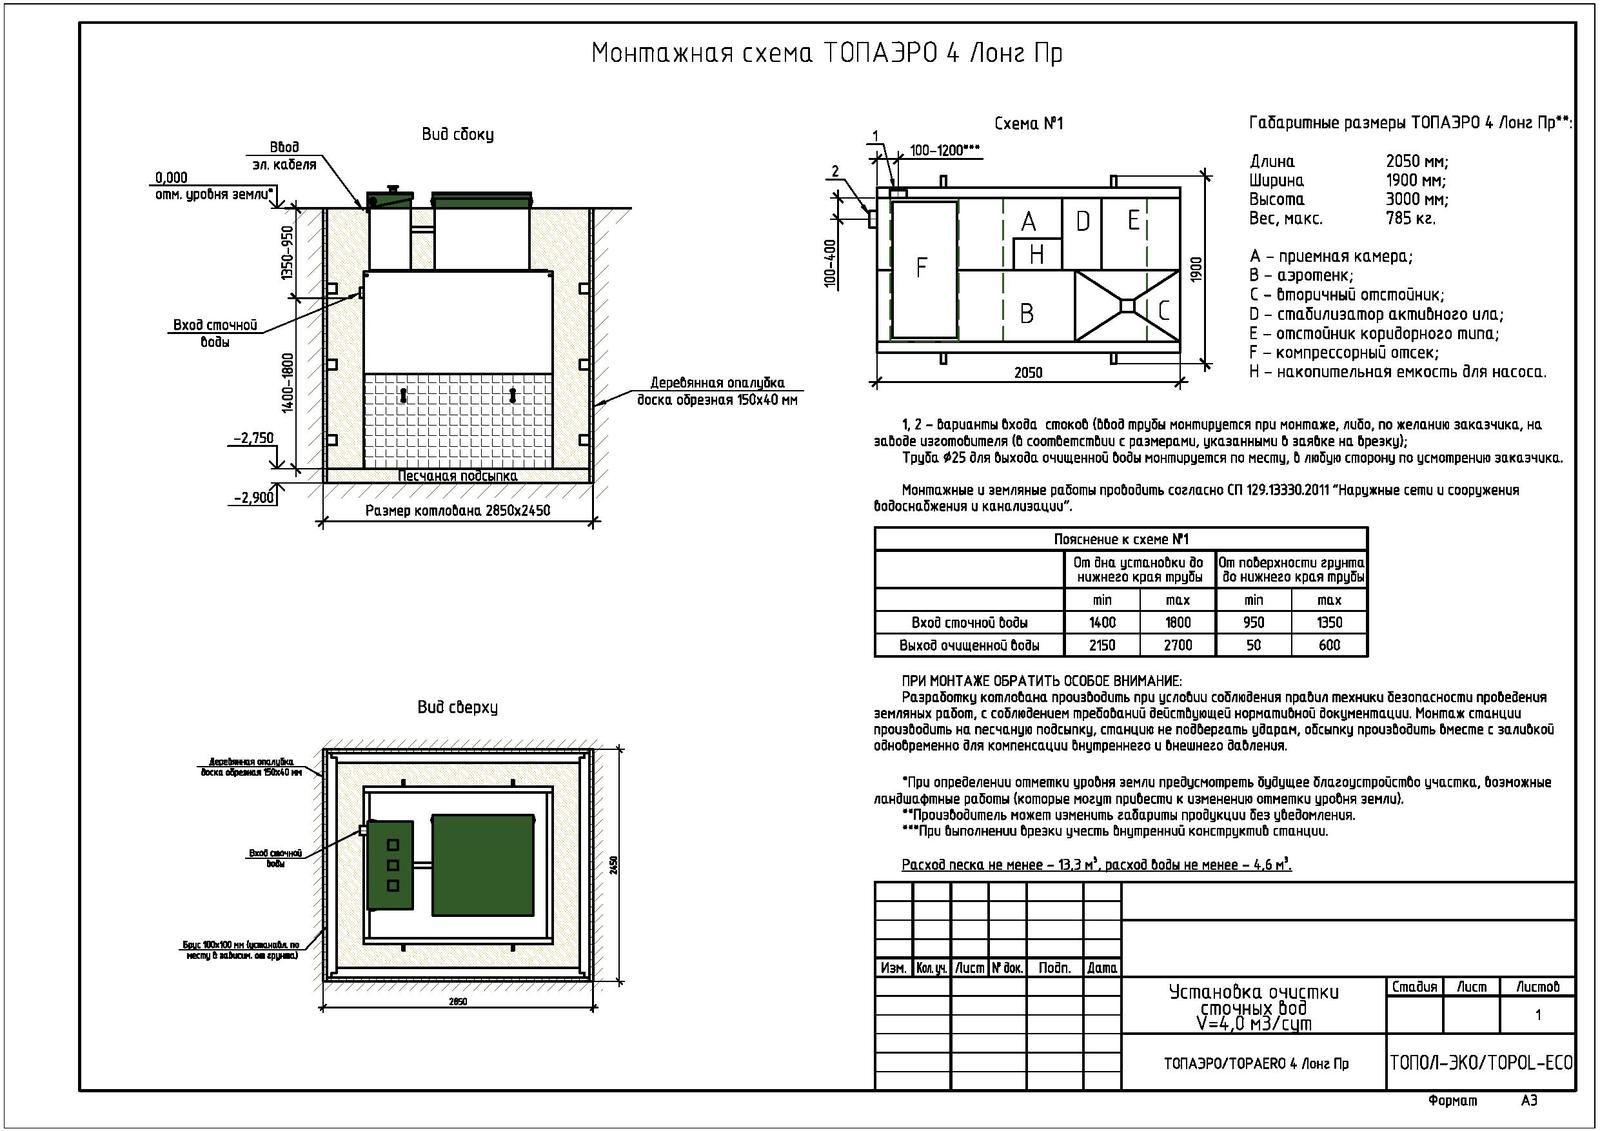 Монтажная схема септика Топаэро 4 Лонг ПР